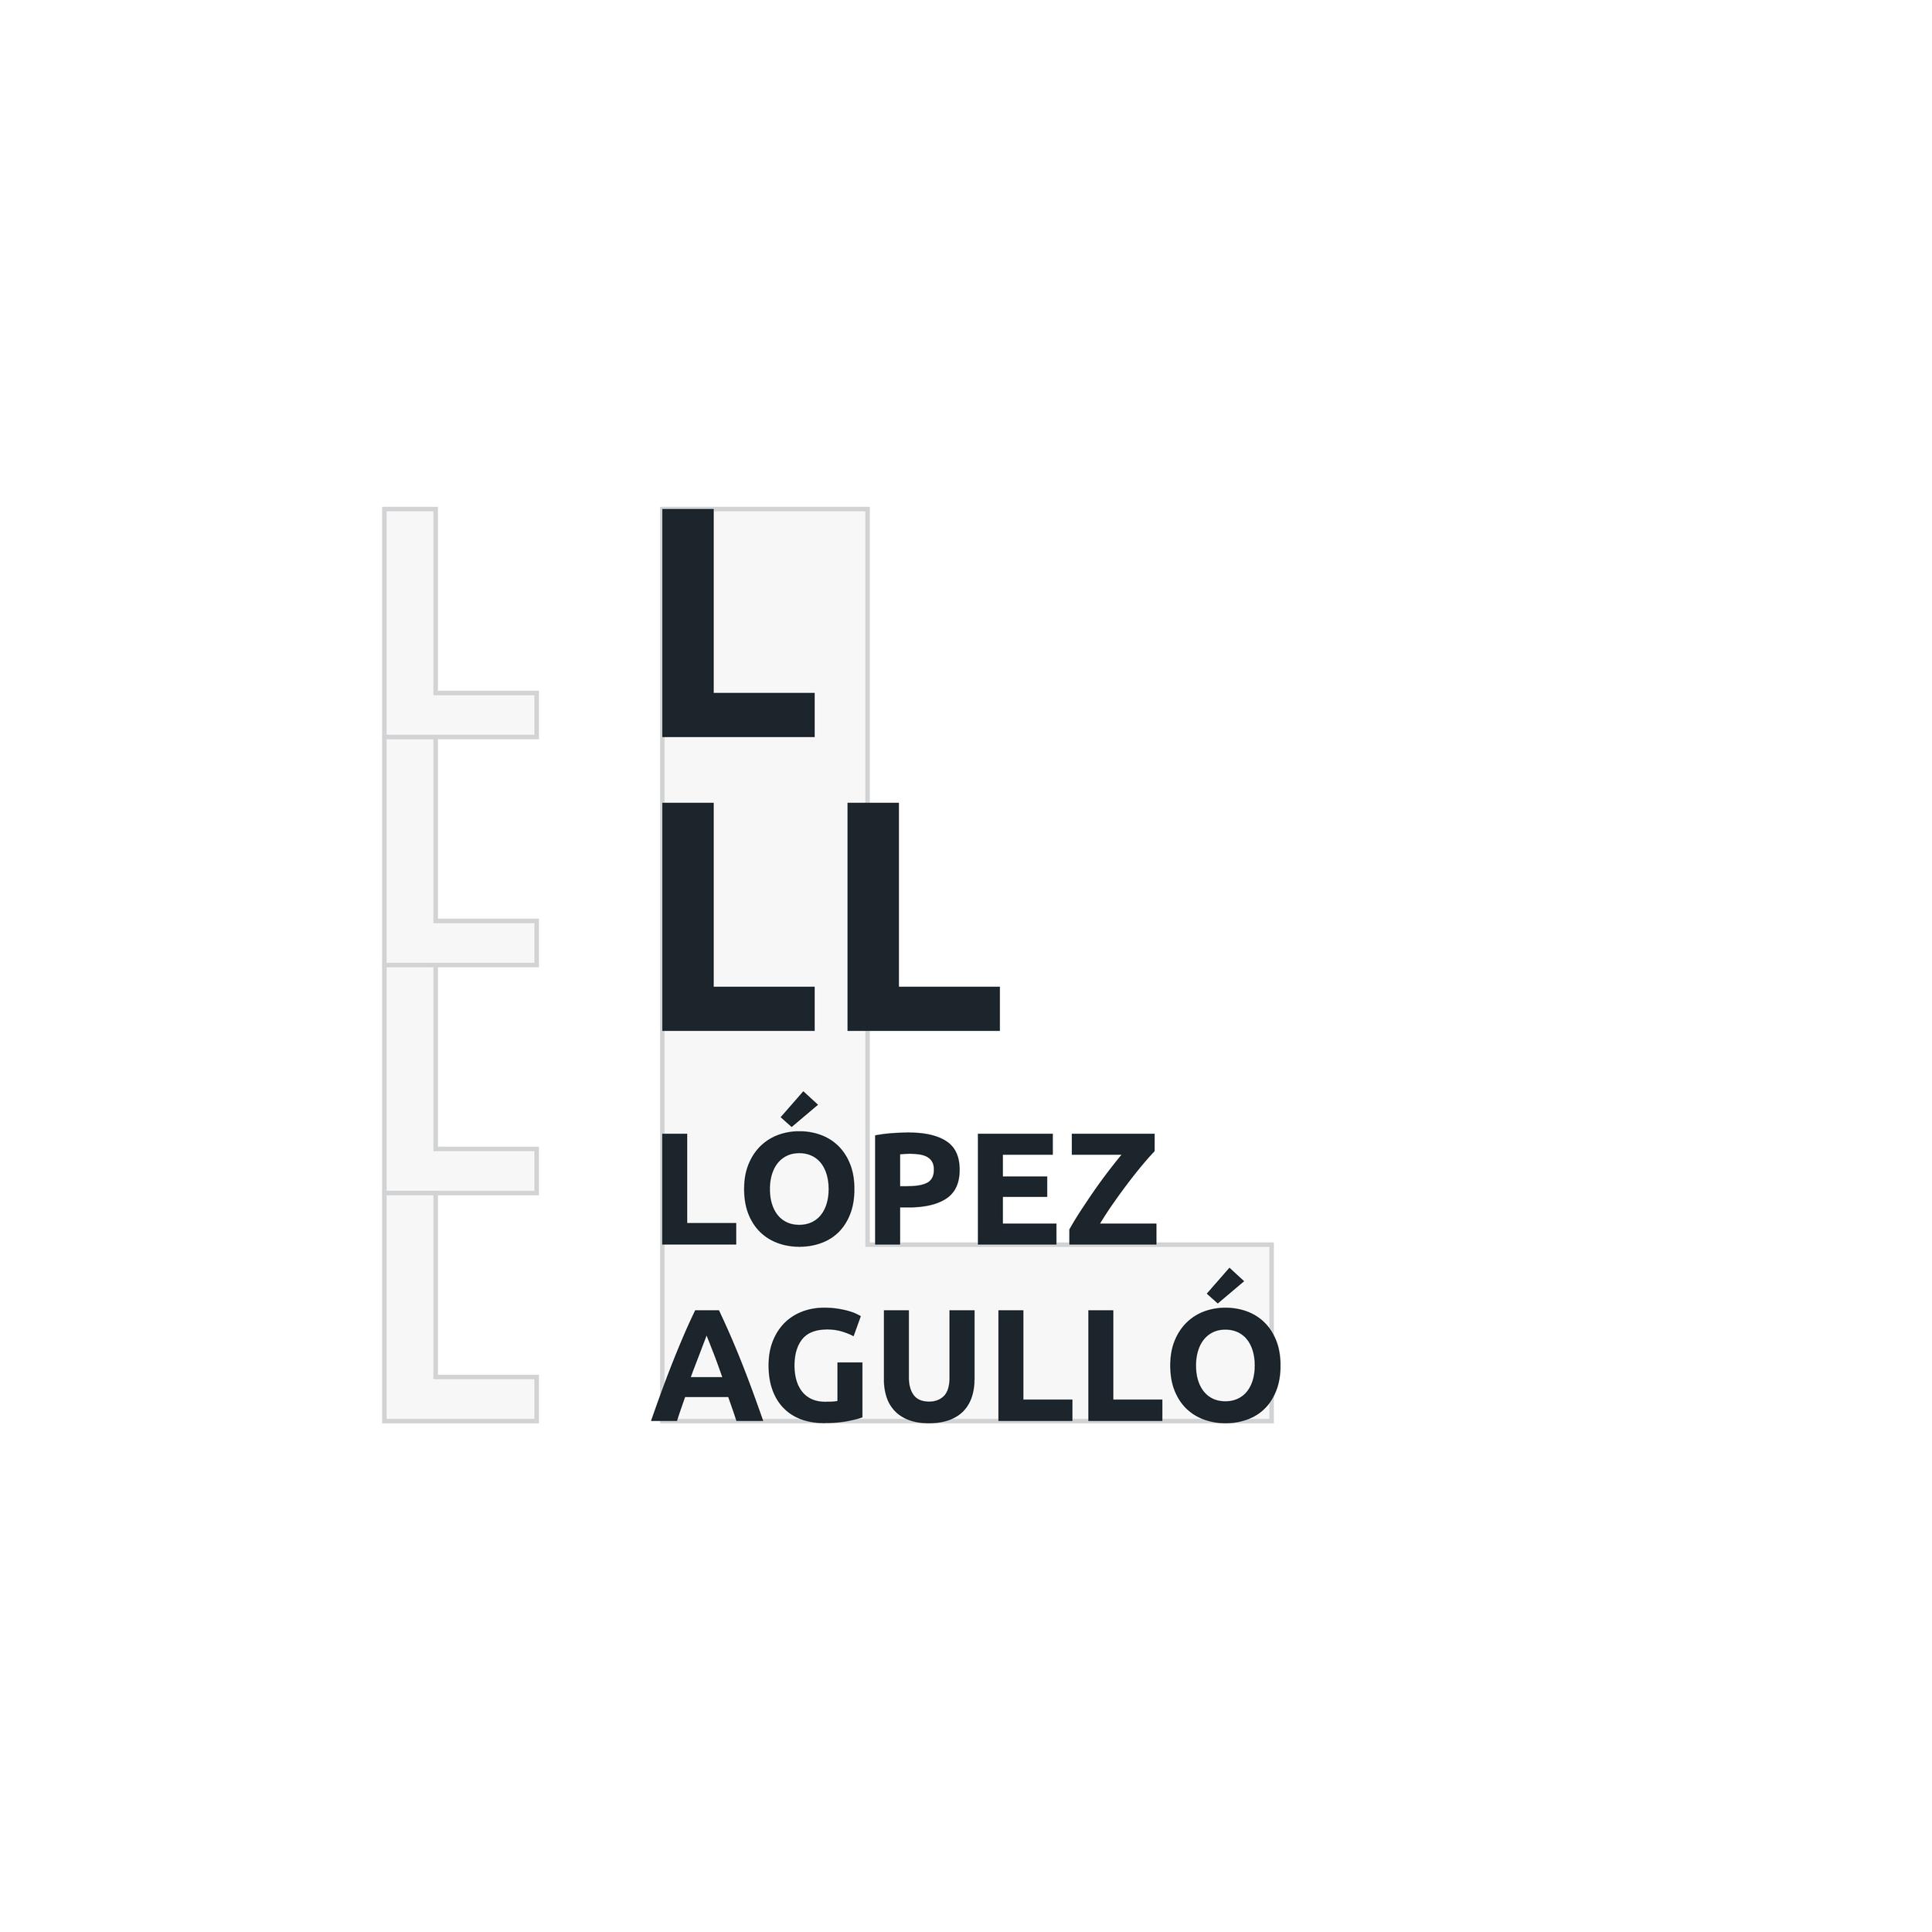 Superfluido - López Agulló4.png